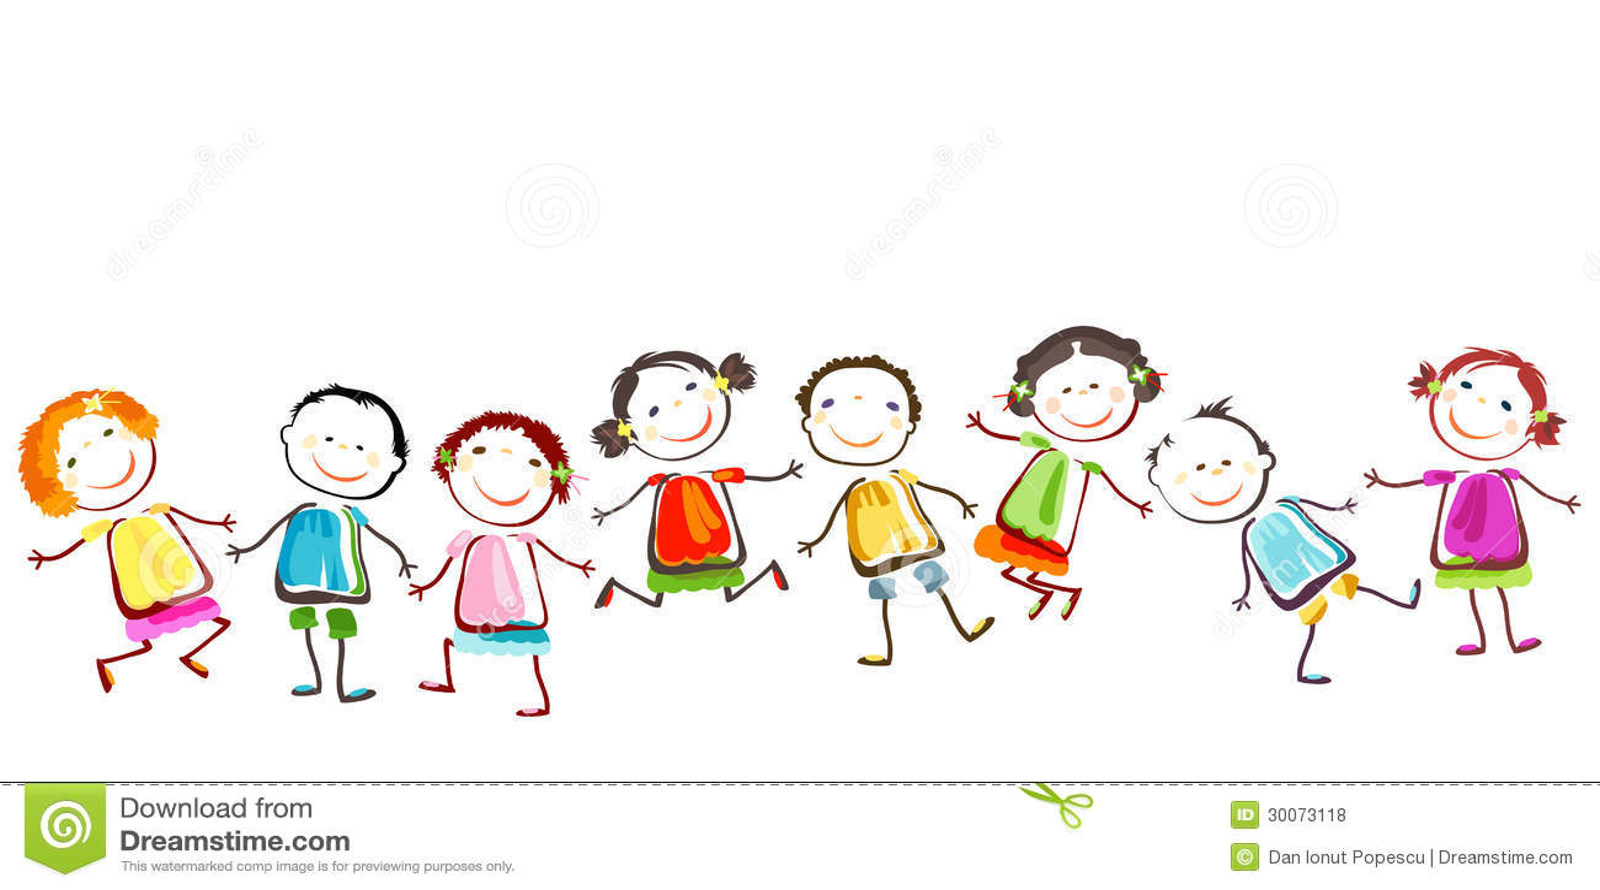 Happy Children Royalty Free Stock Photos Image 30073118